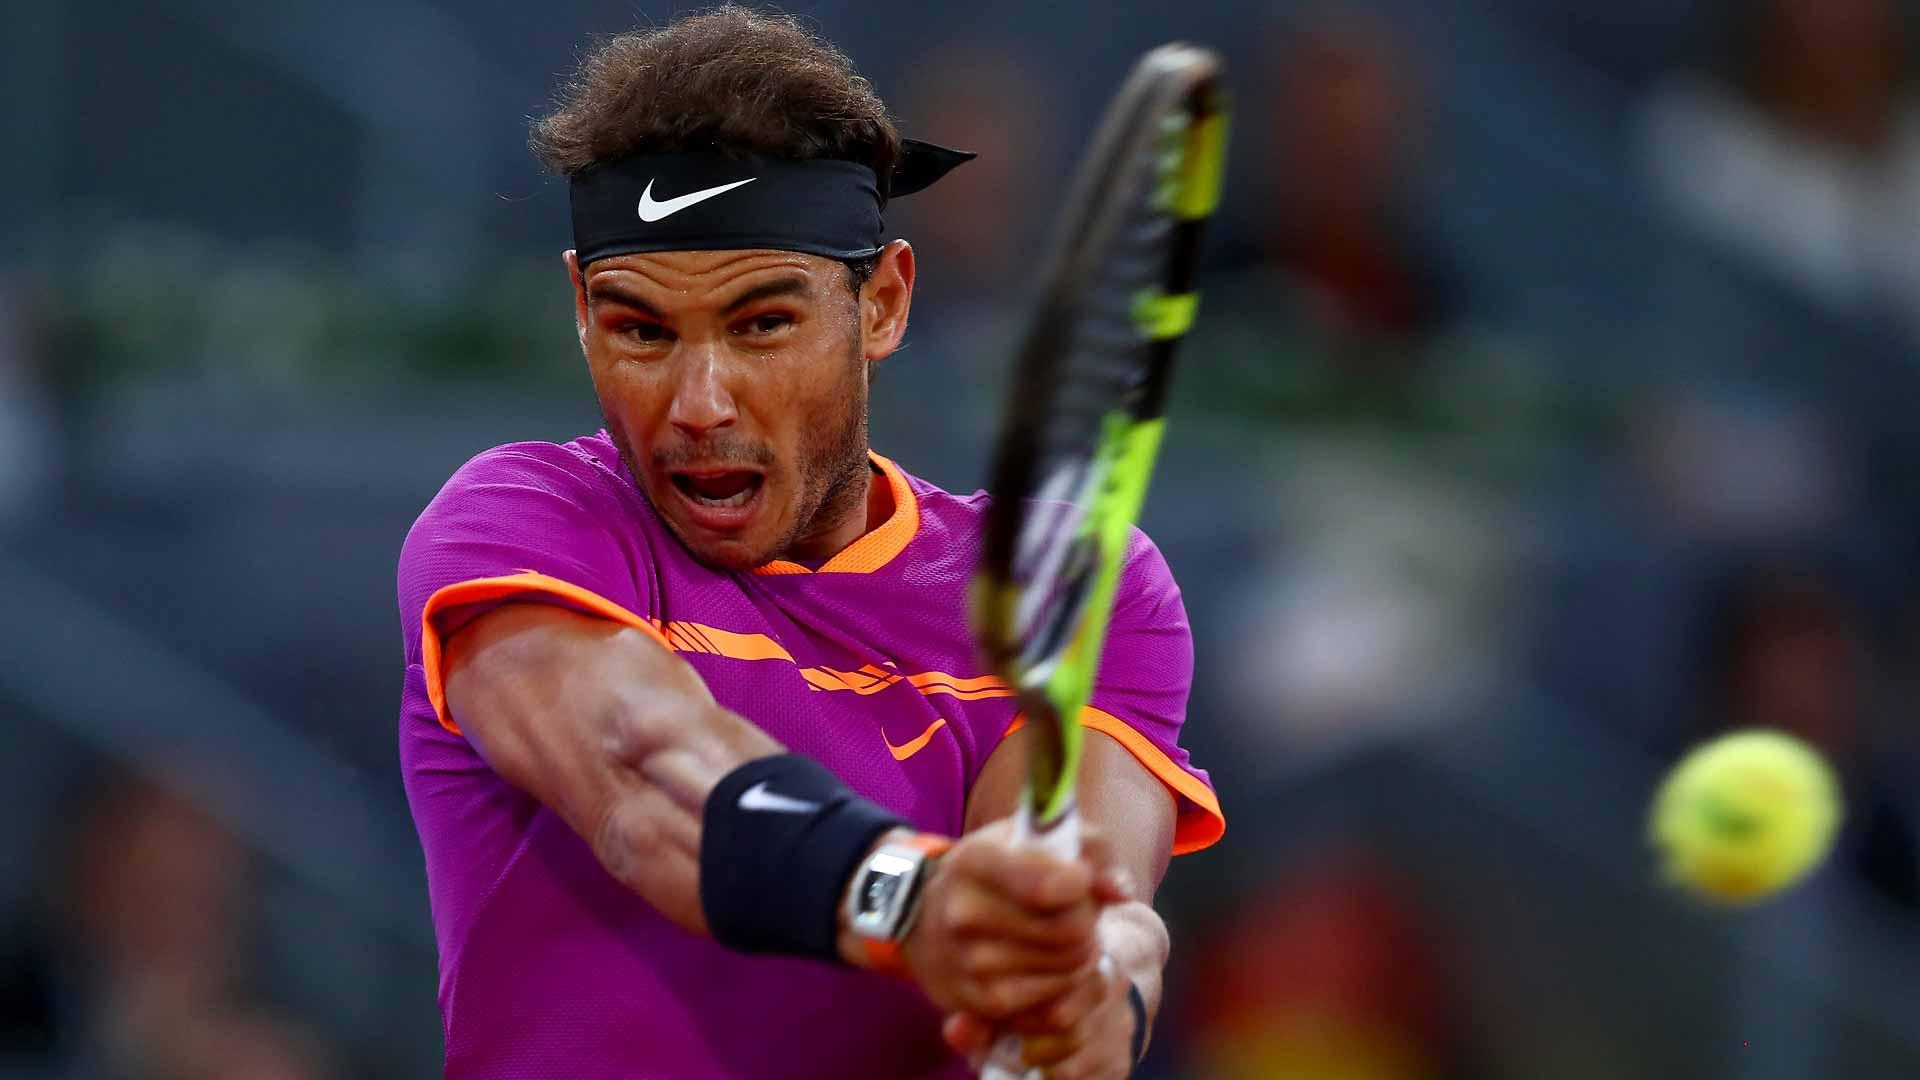 Rafael nadal wallpaper 31 34 male players hd backgrounds - Rafael Nadal Wallpaper 31 34 Male Players Hd Backgrounds 28